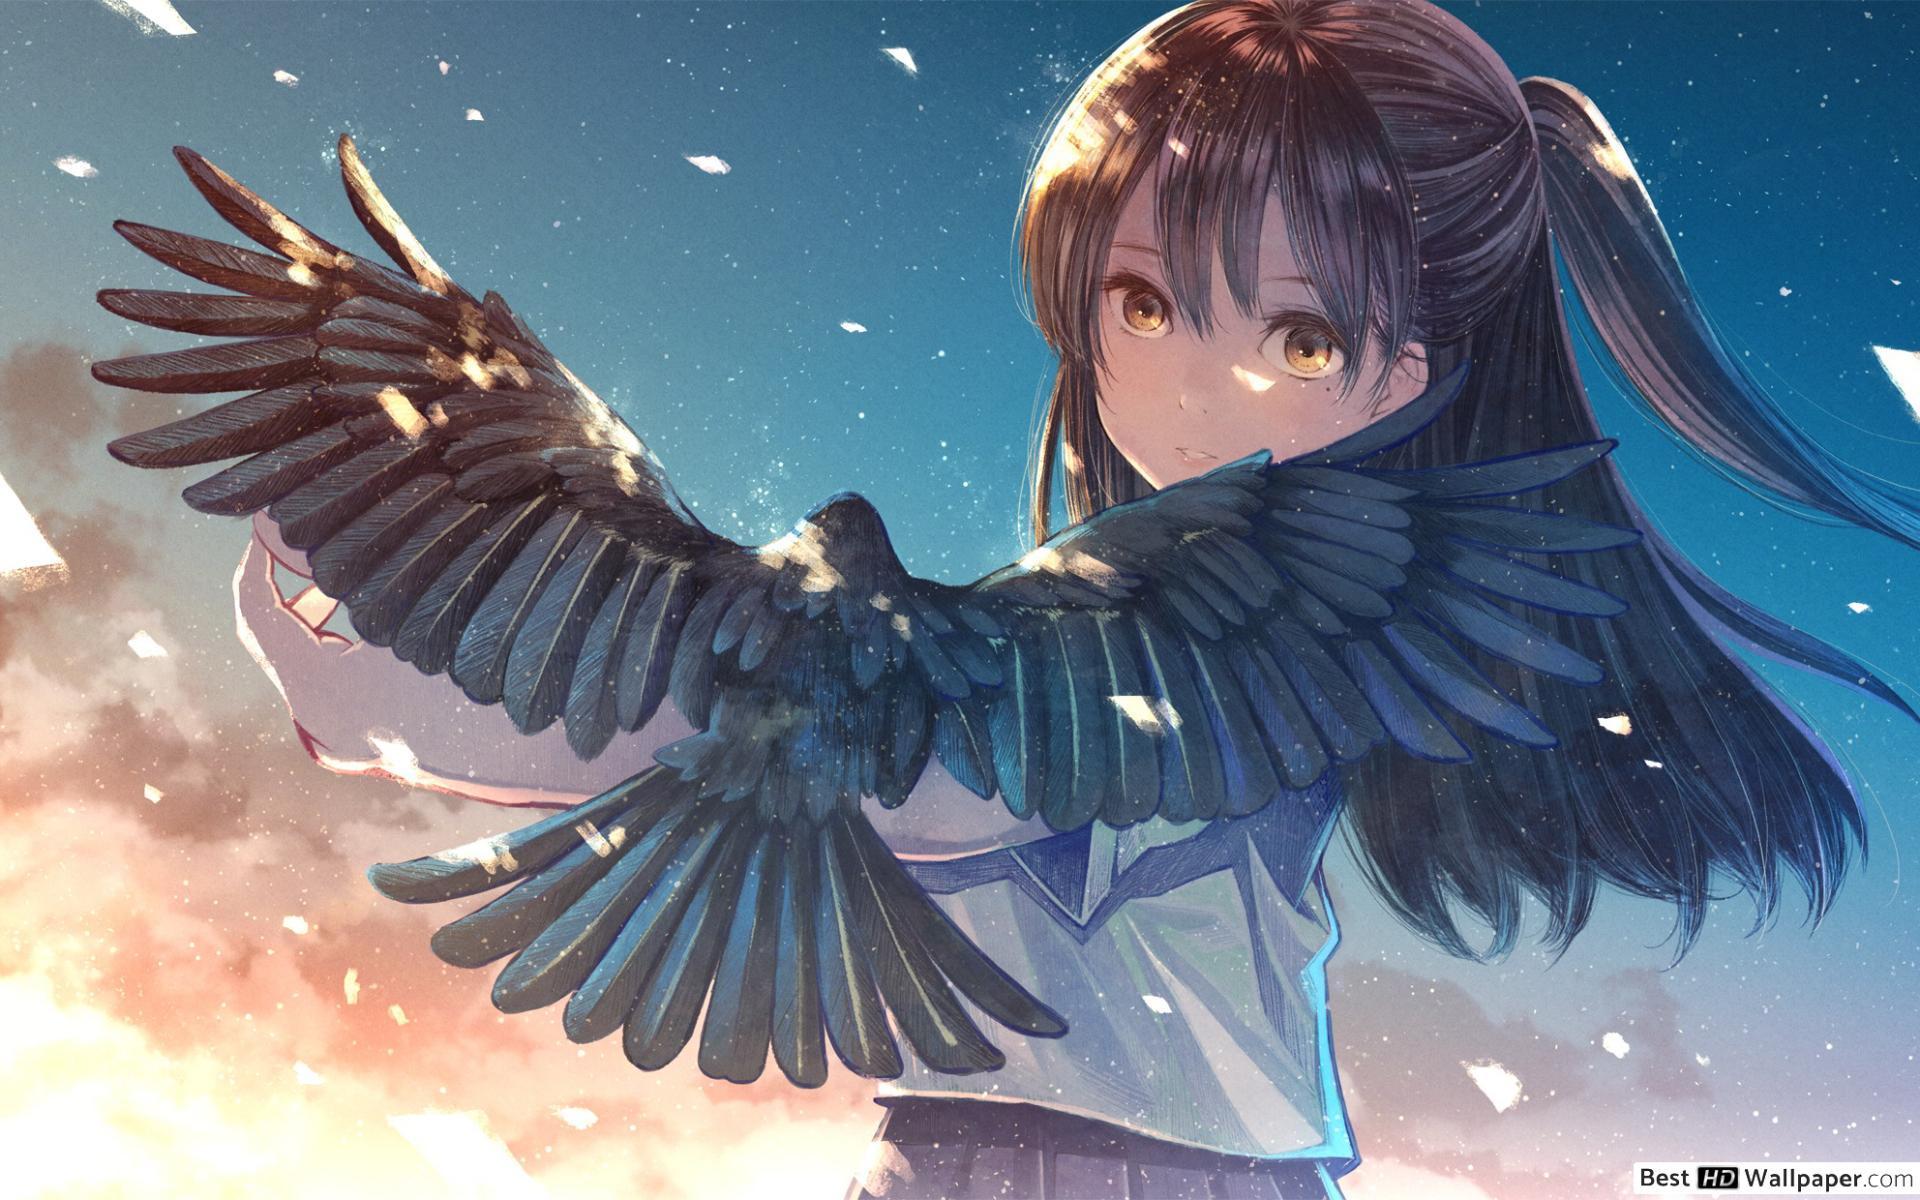 Background Hello World Anime Wallpaper Hd - Allwallpaper